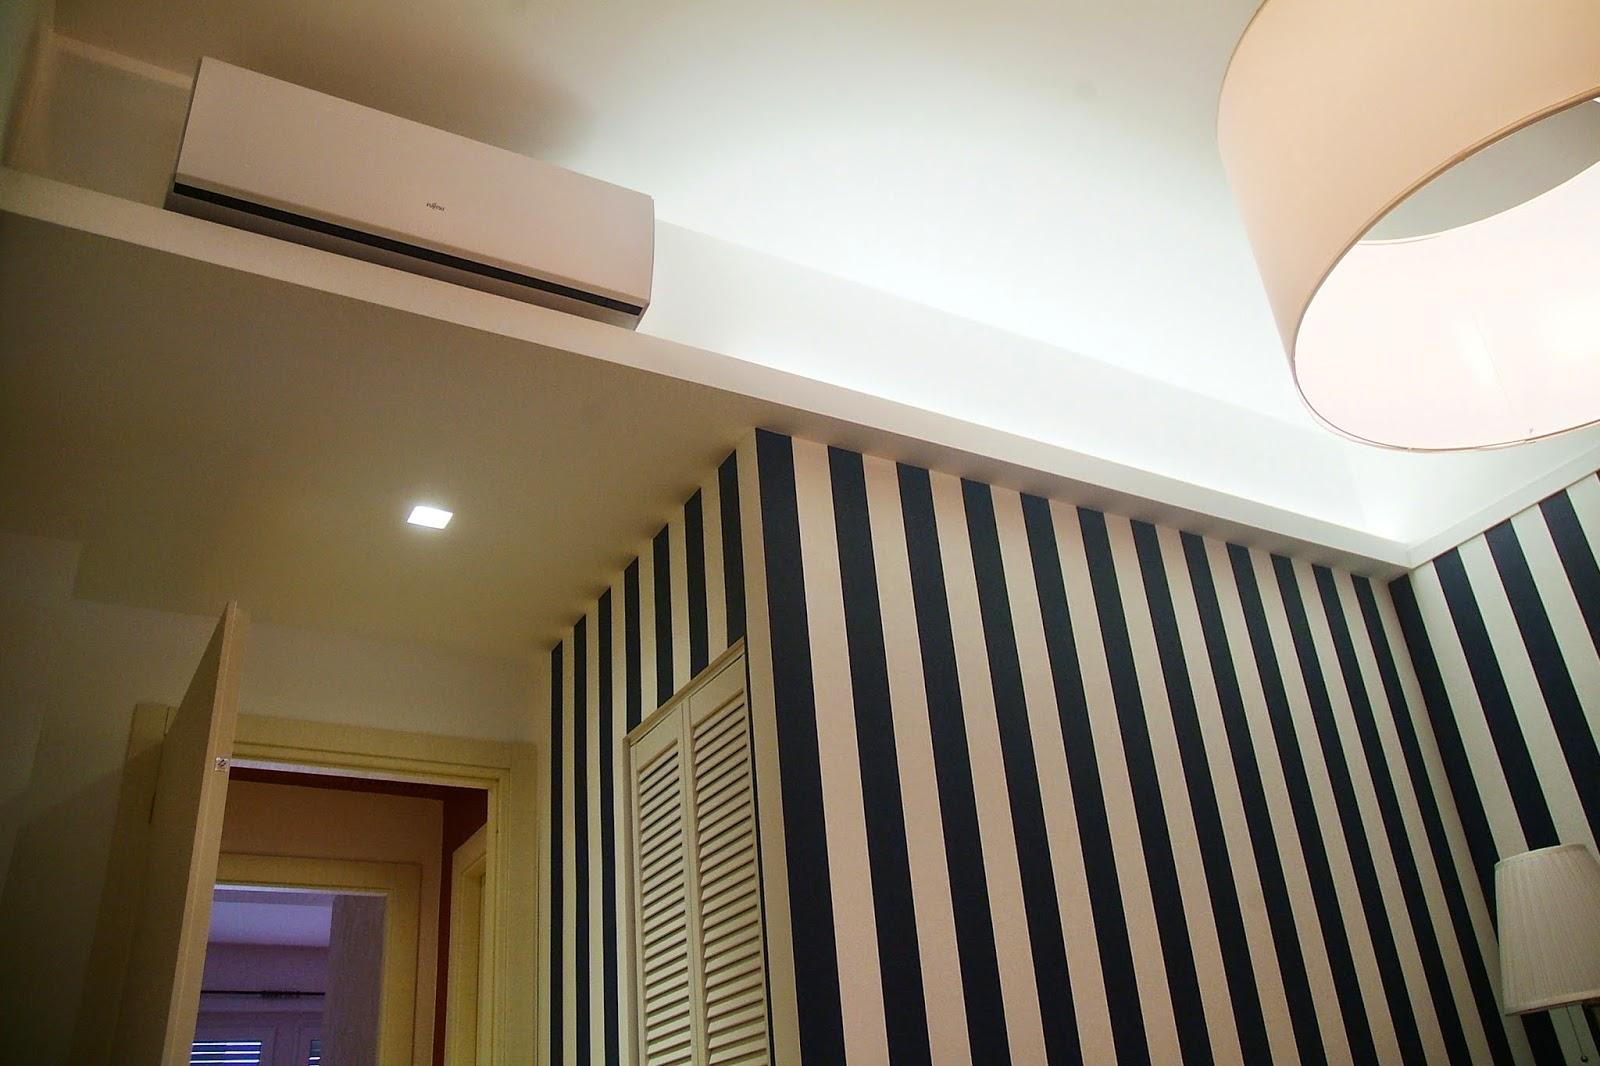 Illuminazione led travi a vista ~ idee di design nella vostra casa